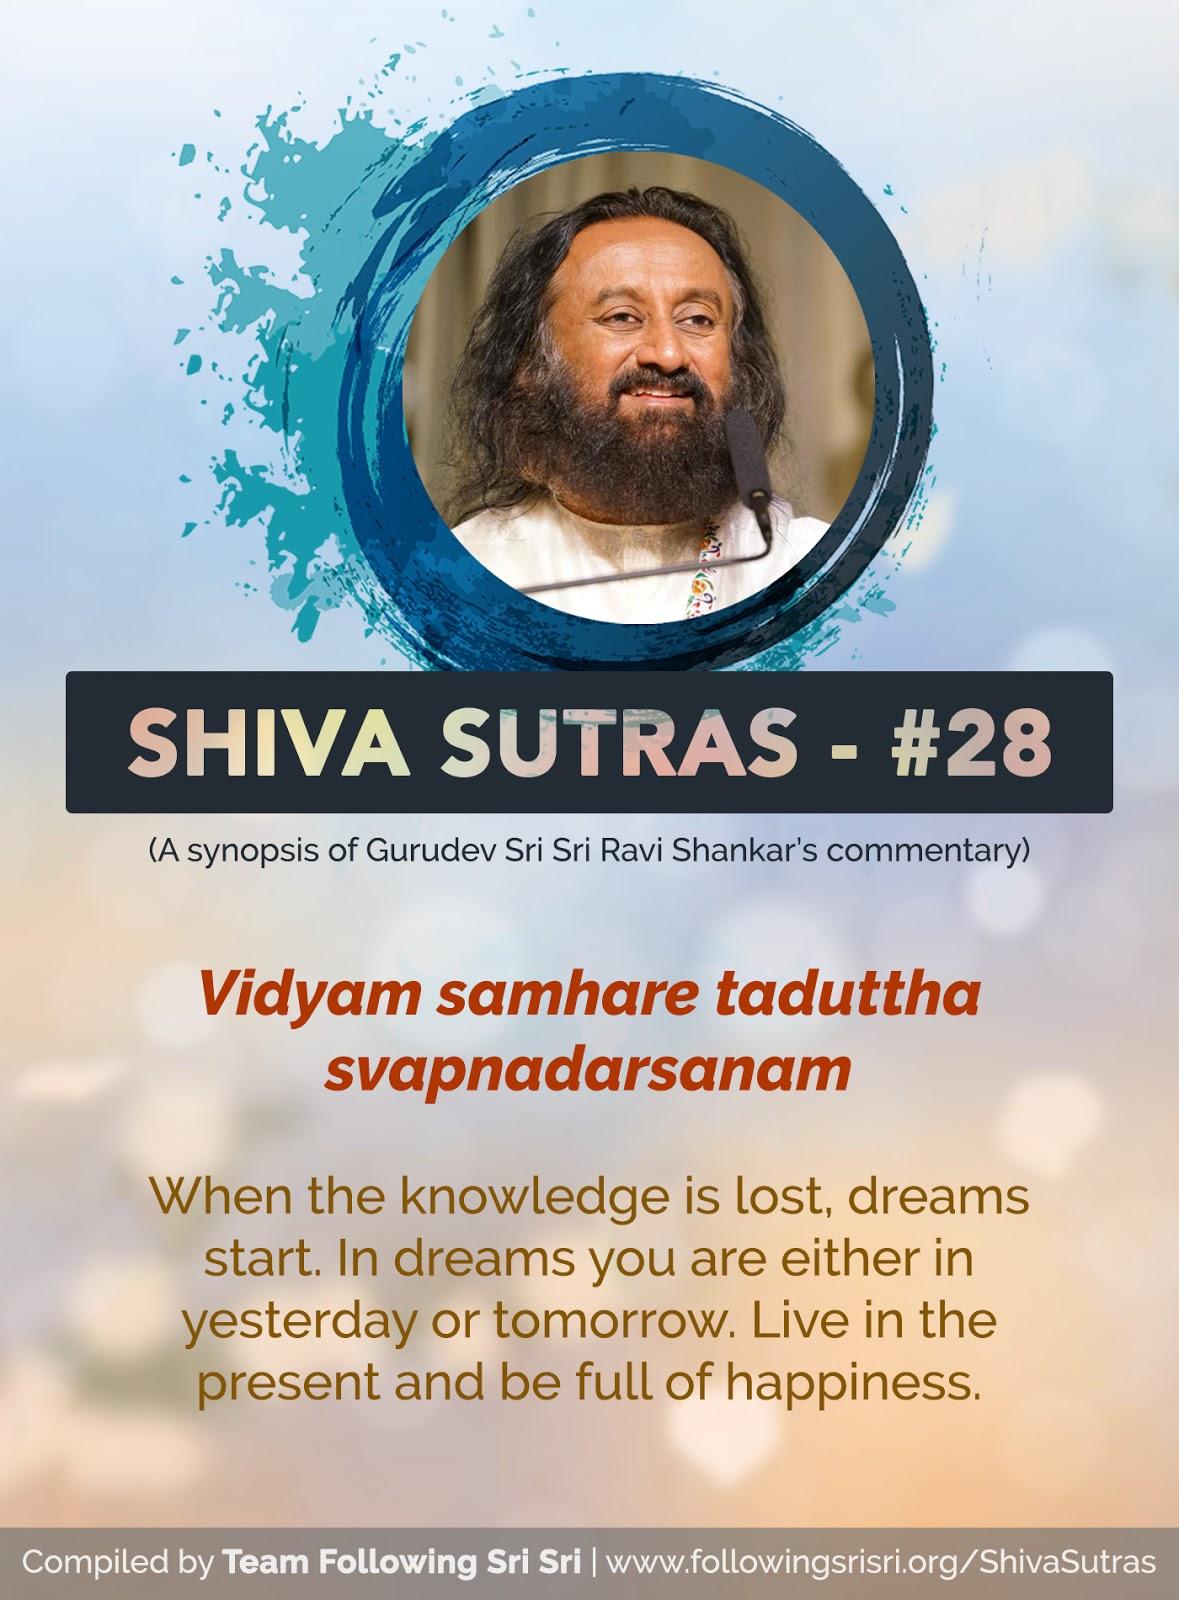 Shiva Sutras - Sutra 28